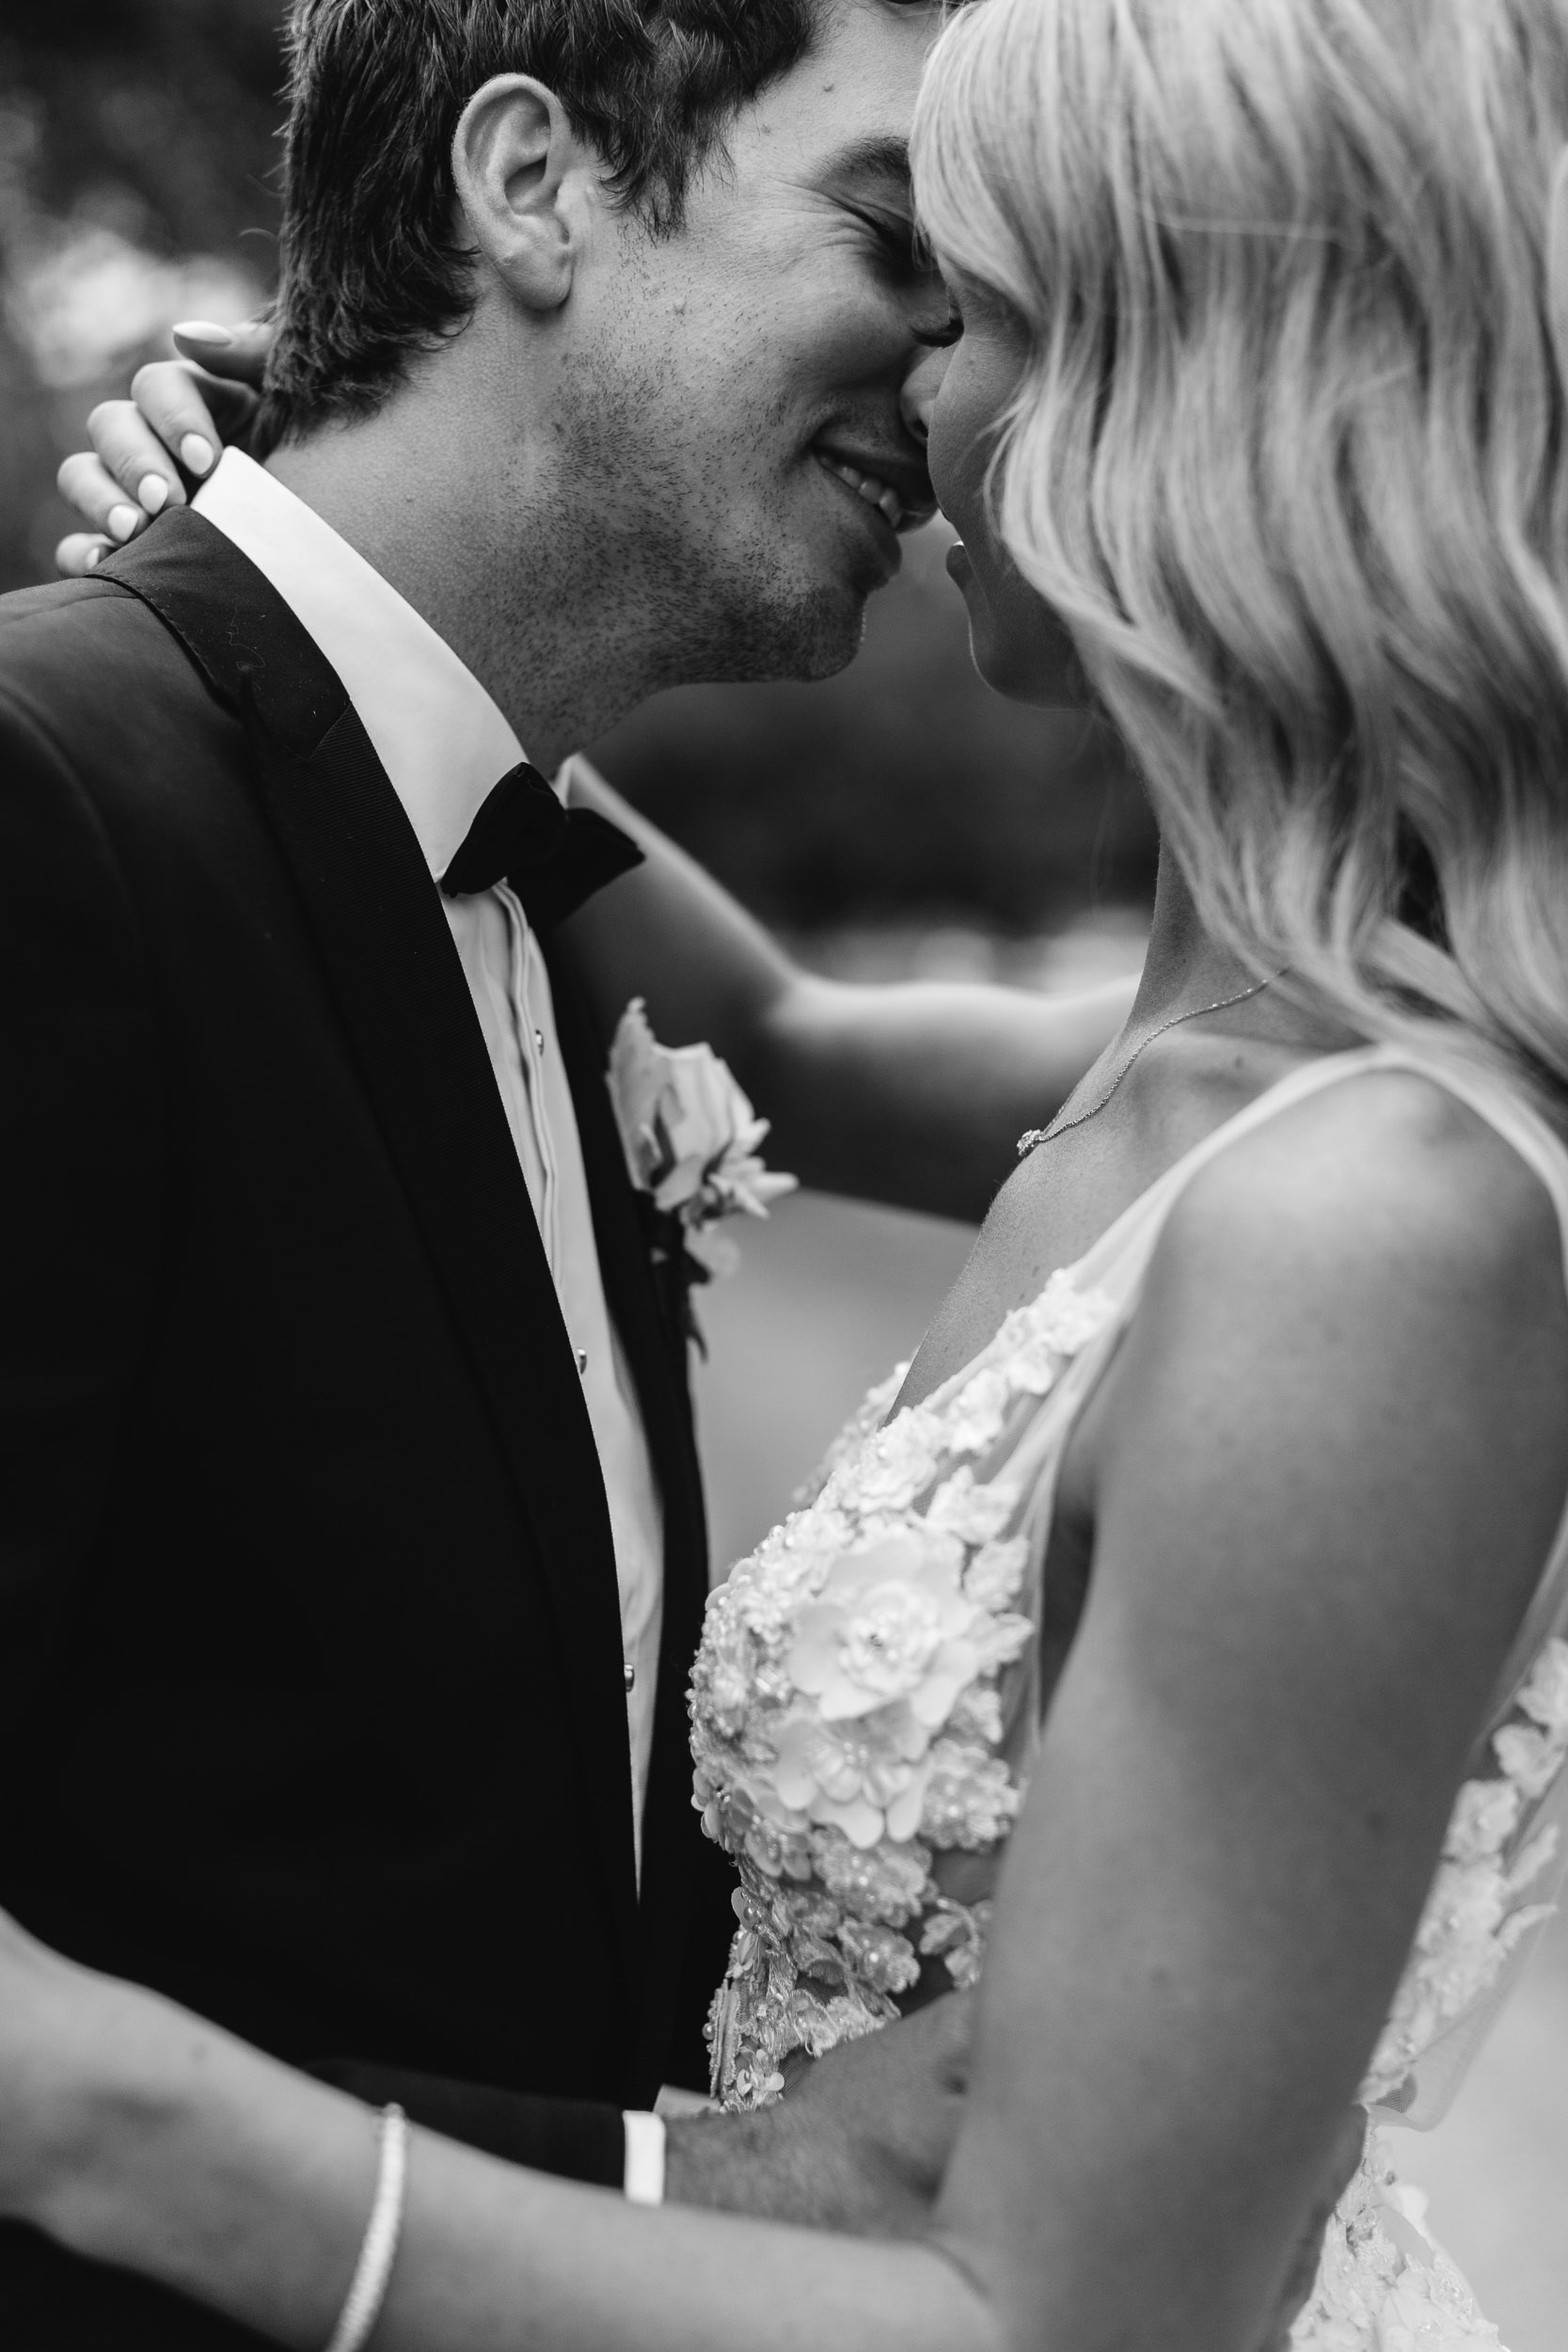 Kas-Richards-Mornington-Peninsula-Private-Property-Wedding-Marianna-Hardwick-Gown-497.jpg